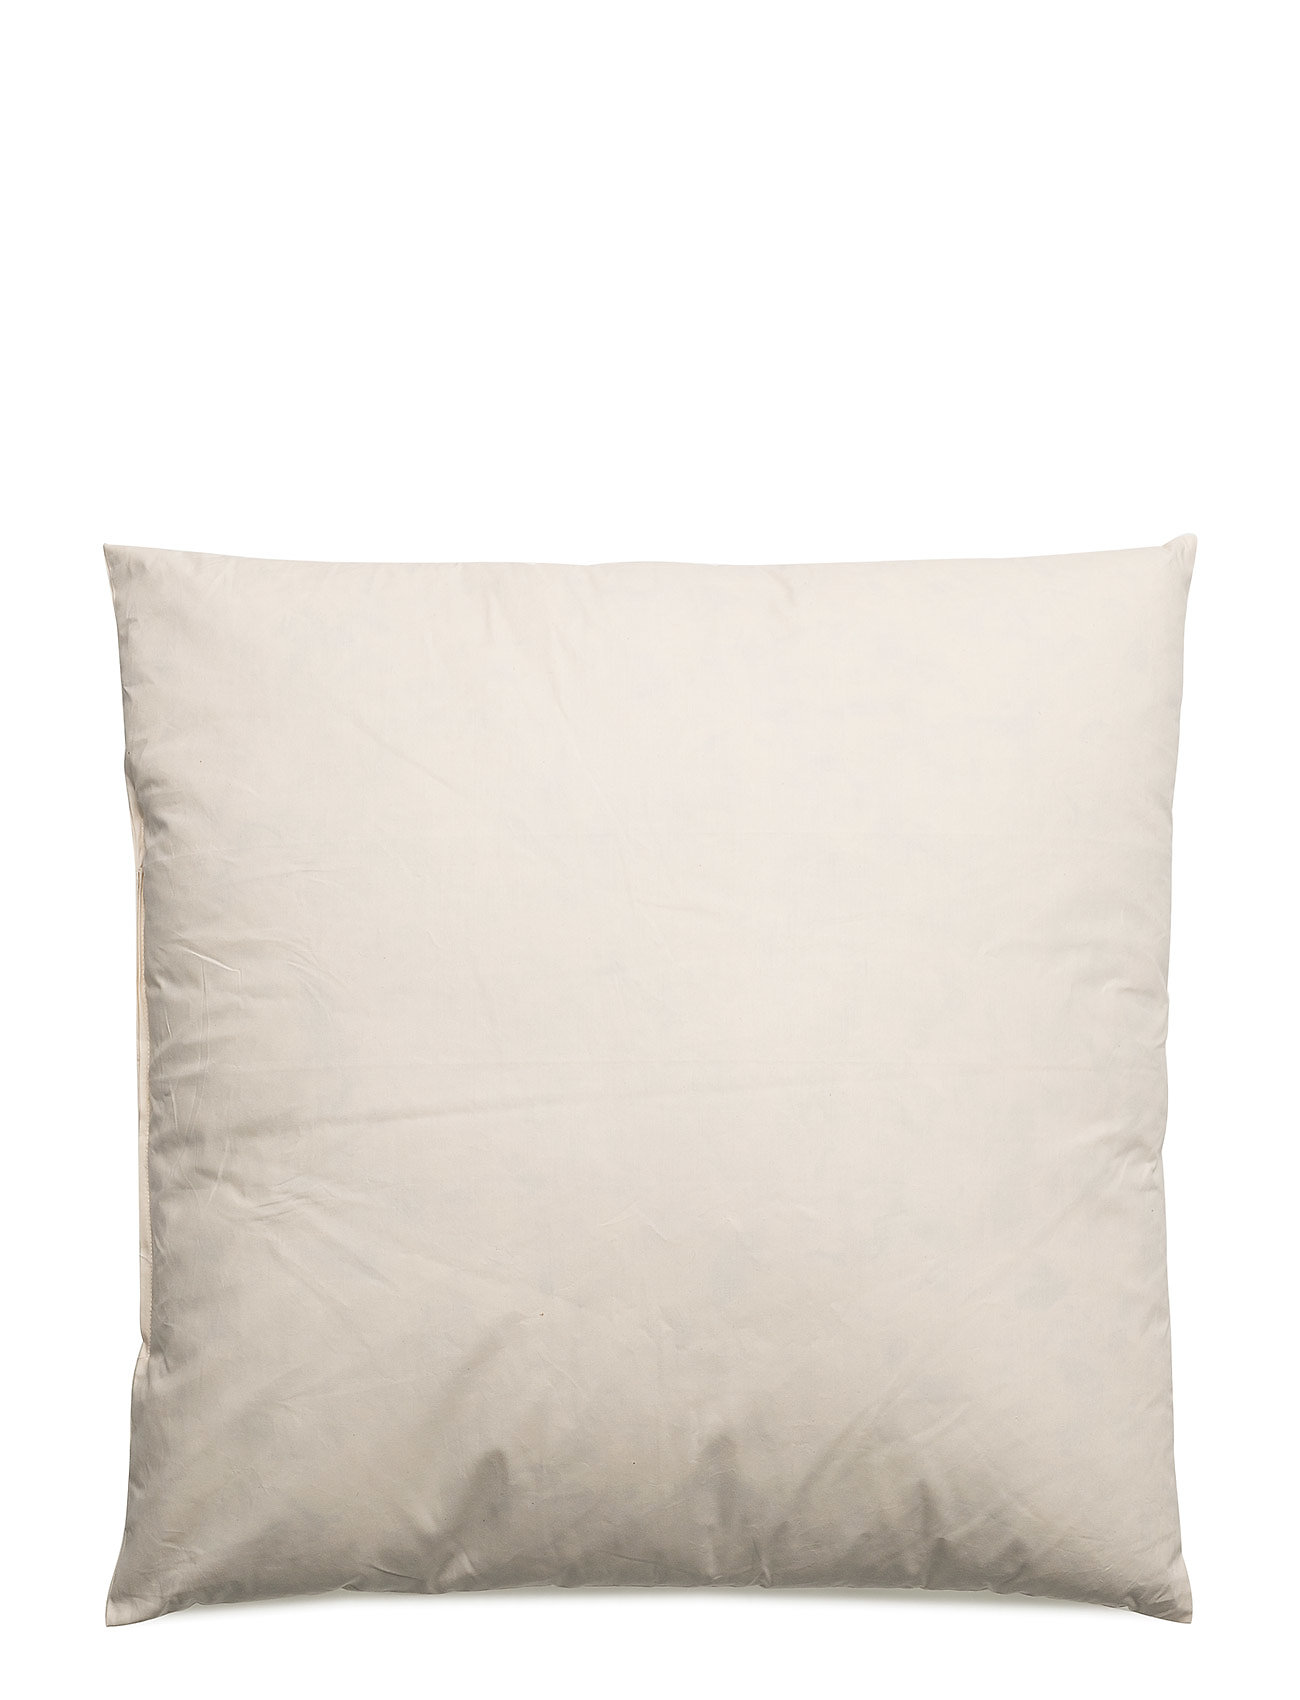 Dirty Linen Insert for decorative cushion - BEIGE